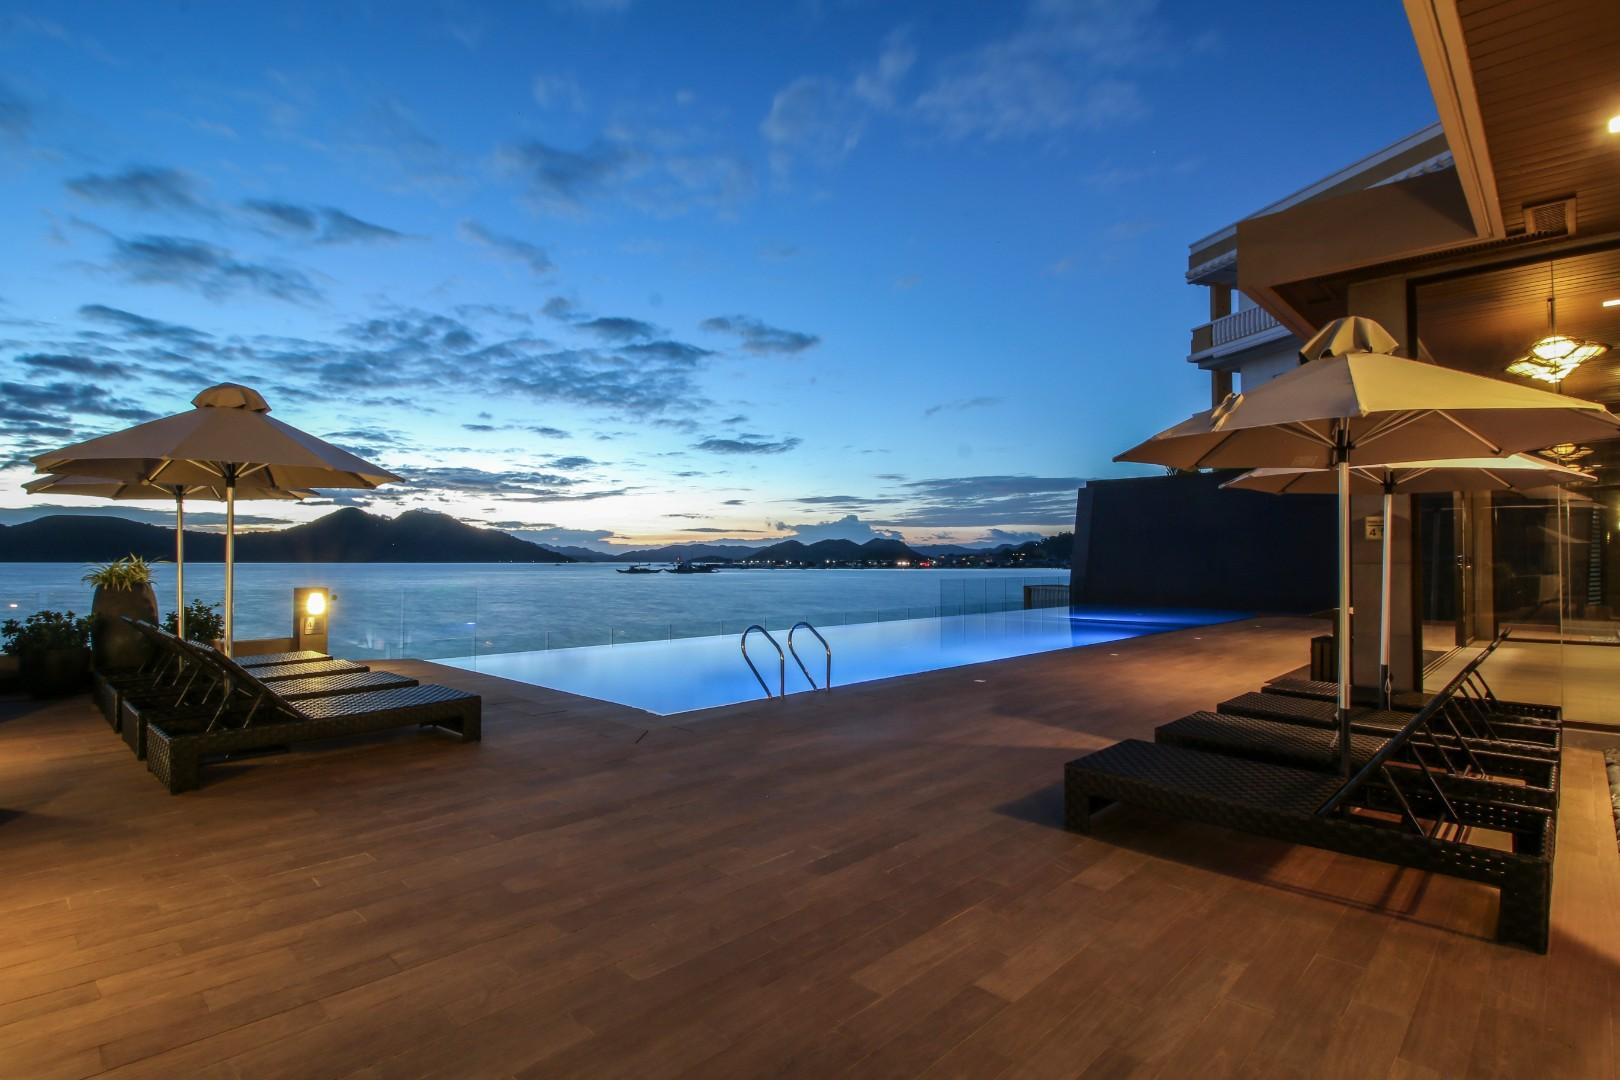 Two Seasons Coron Bayside Hotel Palawan Gallery